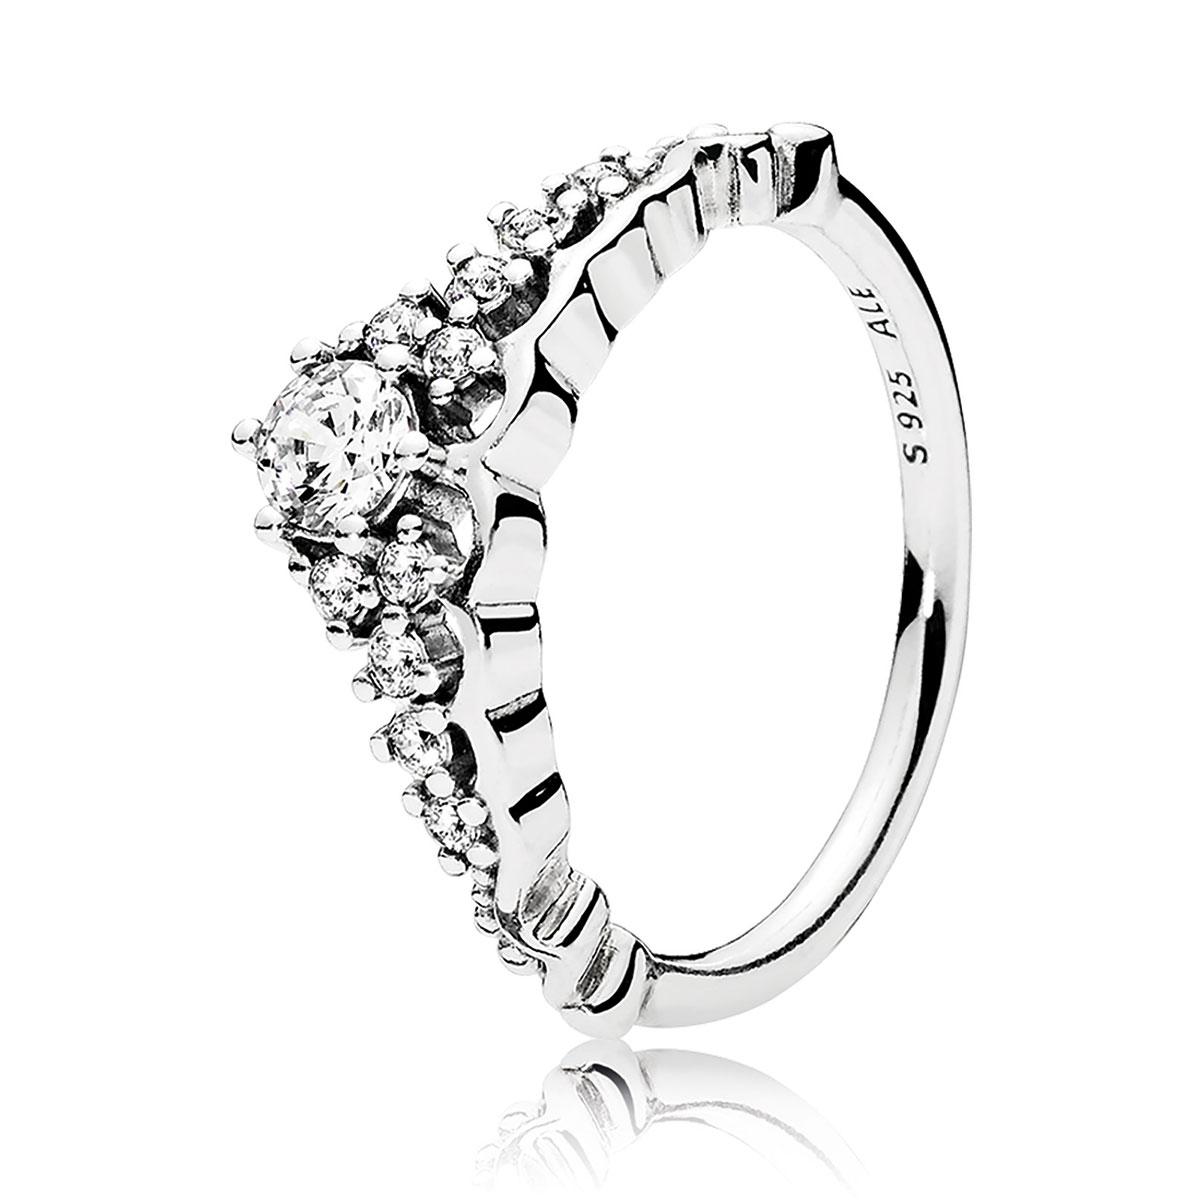 Rings Precious Accents Ltd